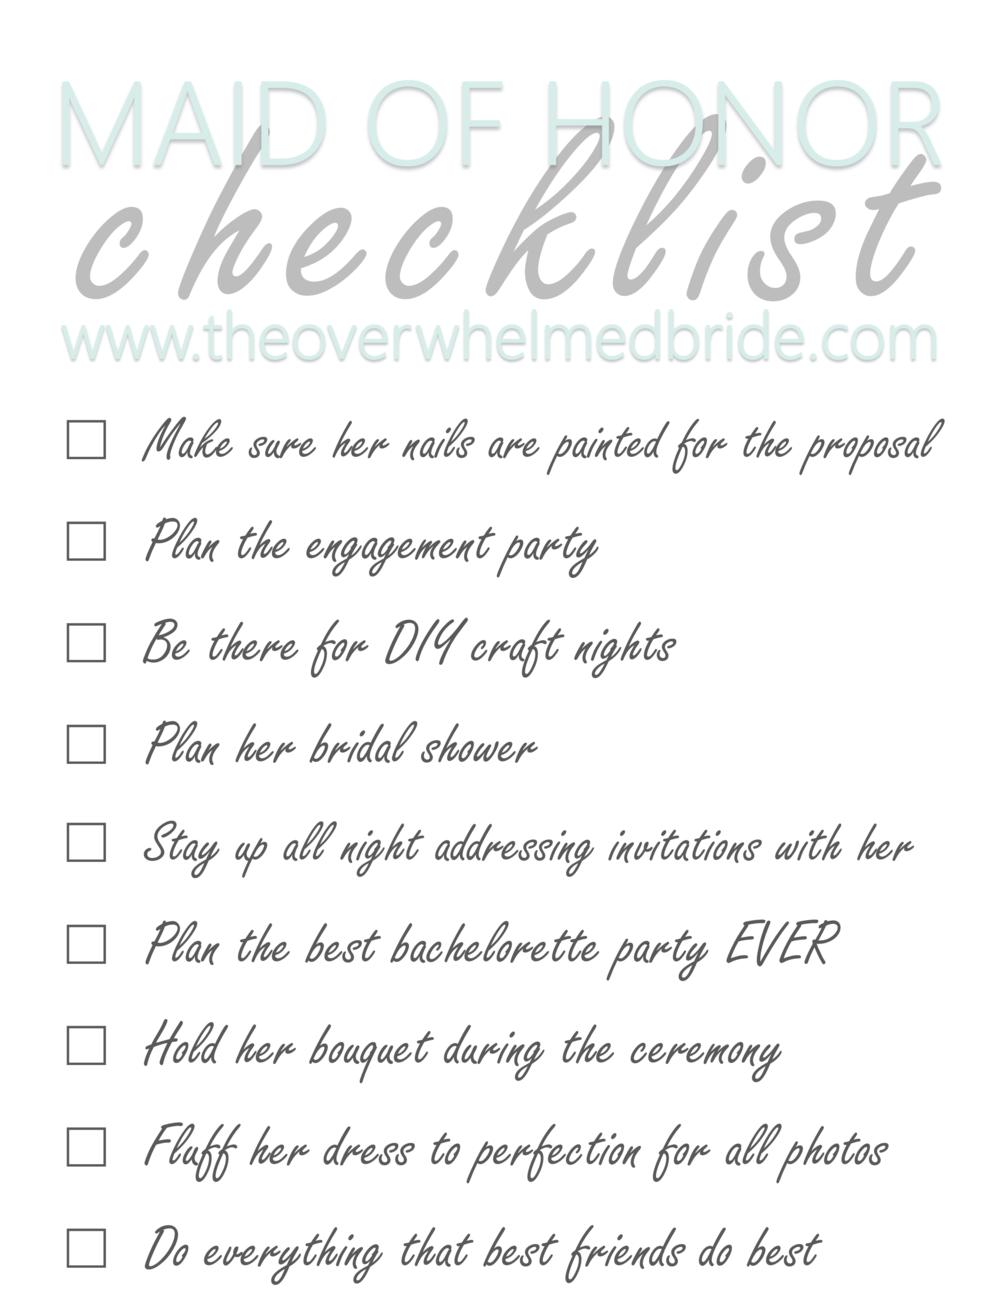 Maid of Honor Checklist The Overwhelmed Bride Wedding Blog